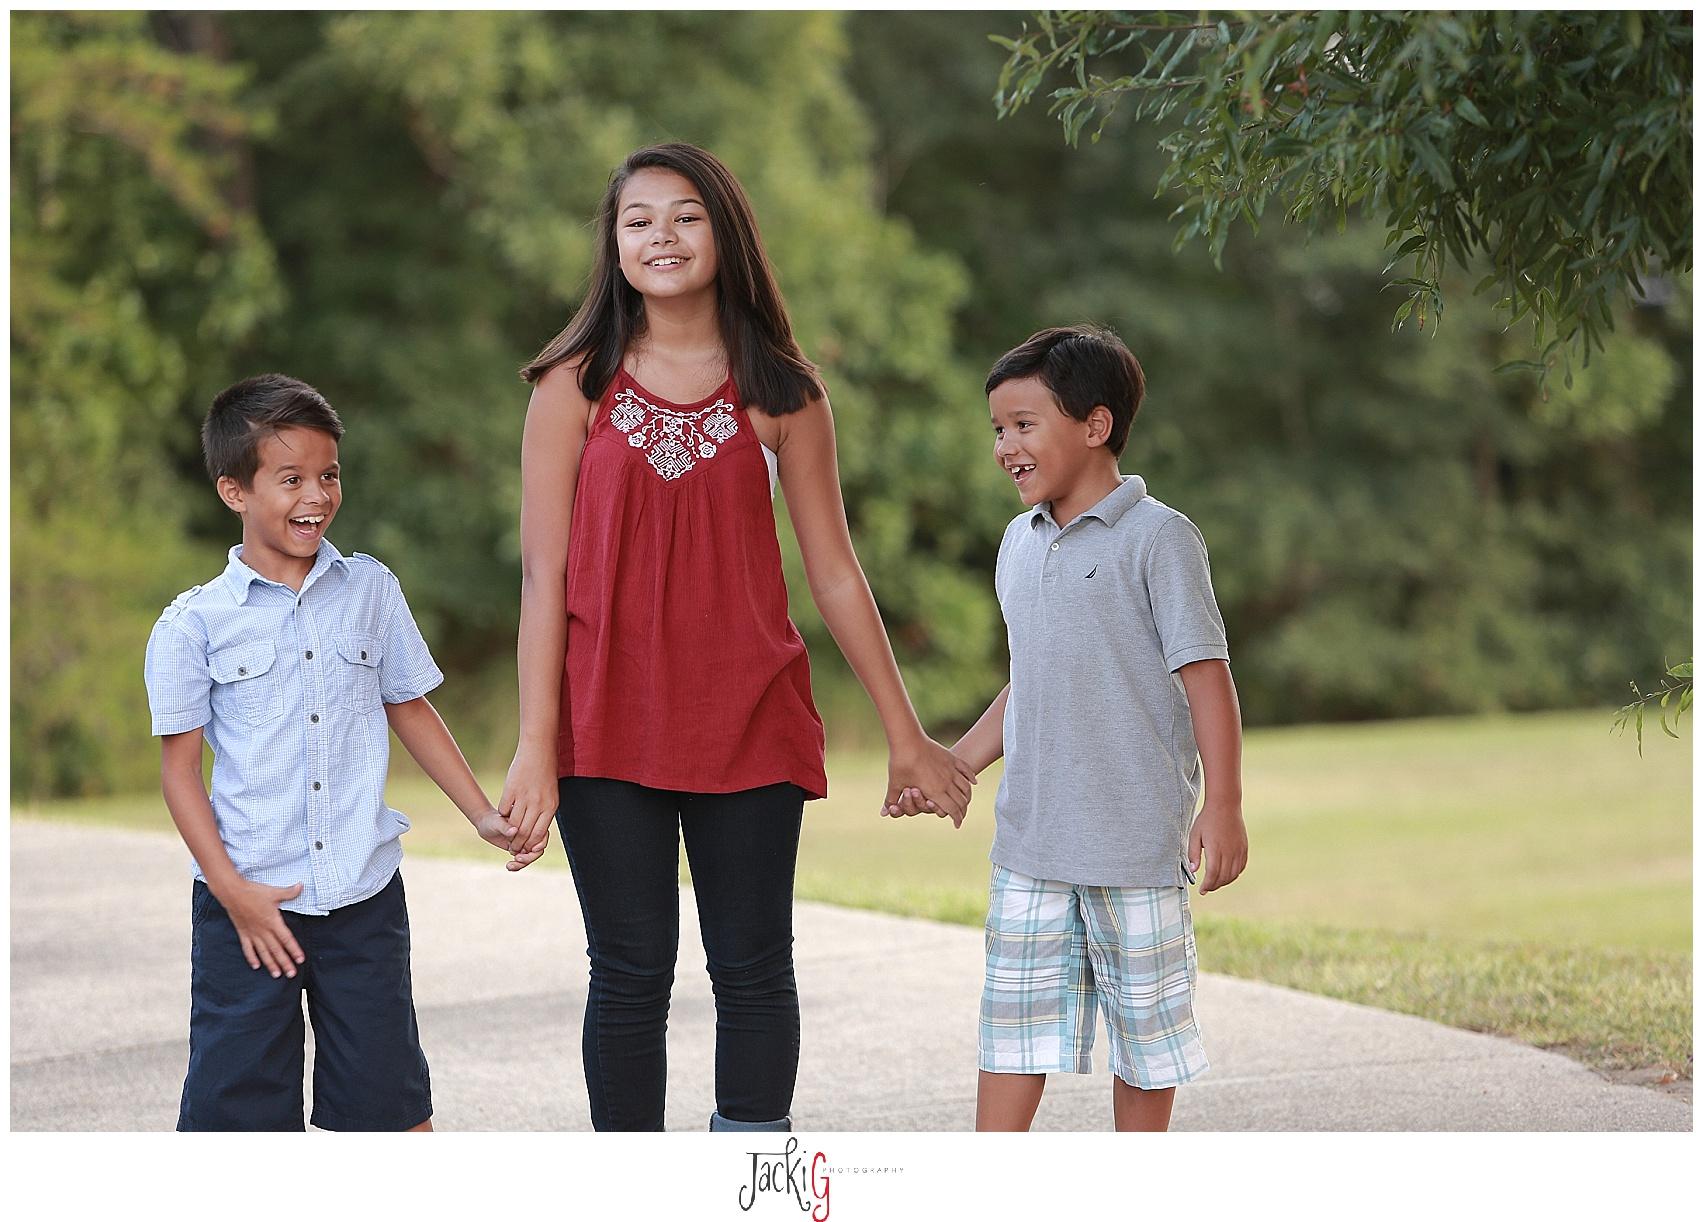 #siblings #love #family